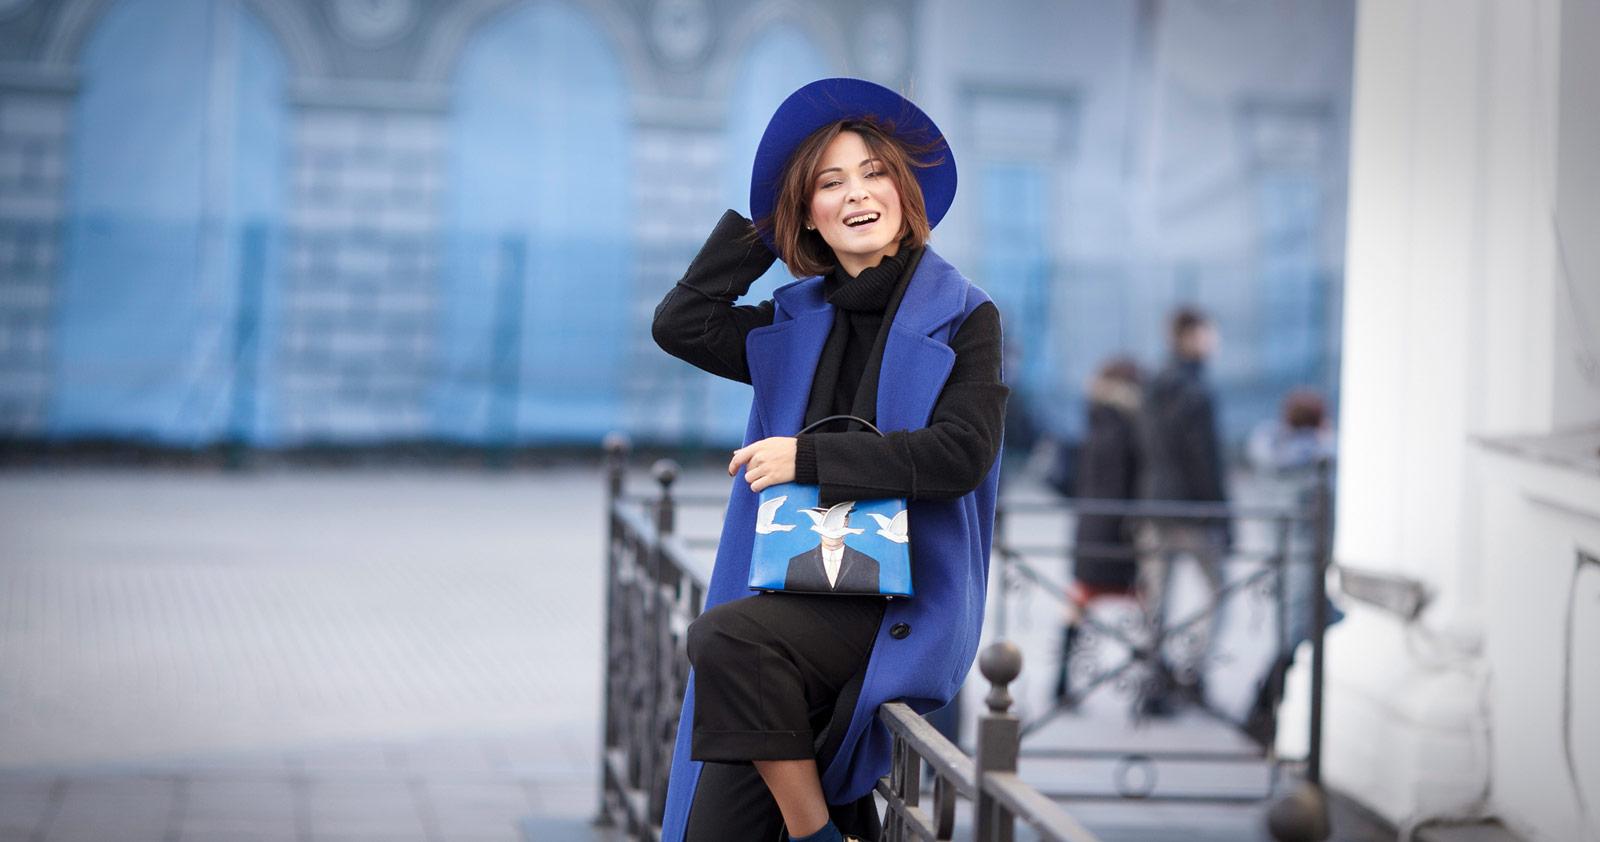 blue_waistcoat-winter_outfit_ideas-ellena_galant_girl-fashion_blogger_style